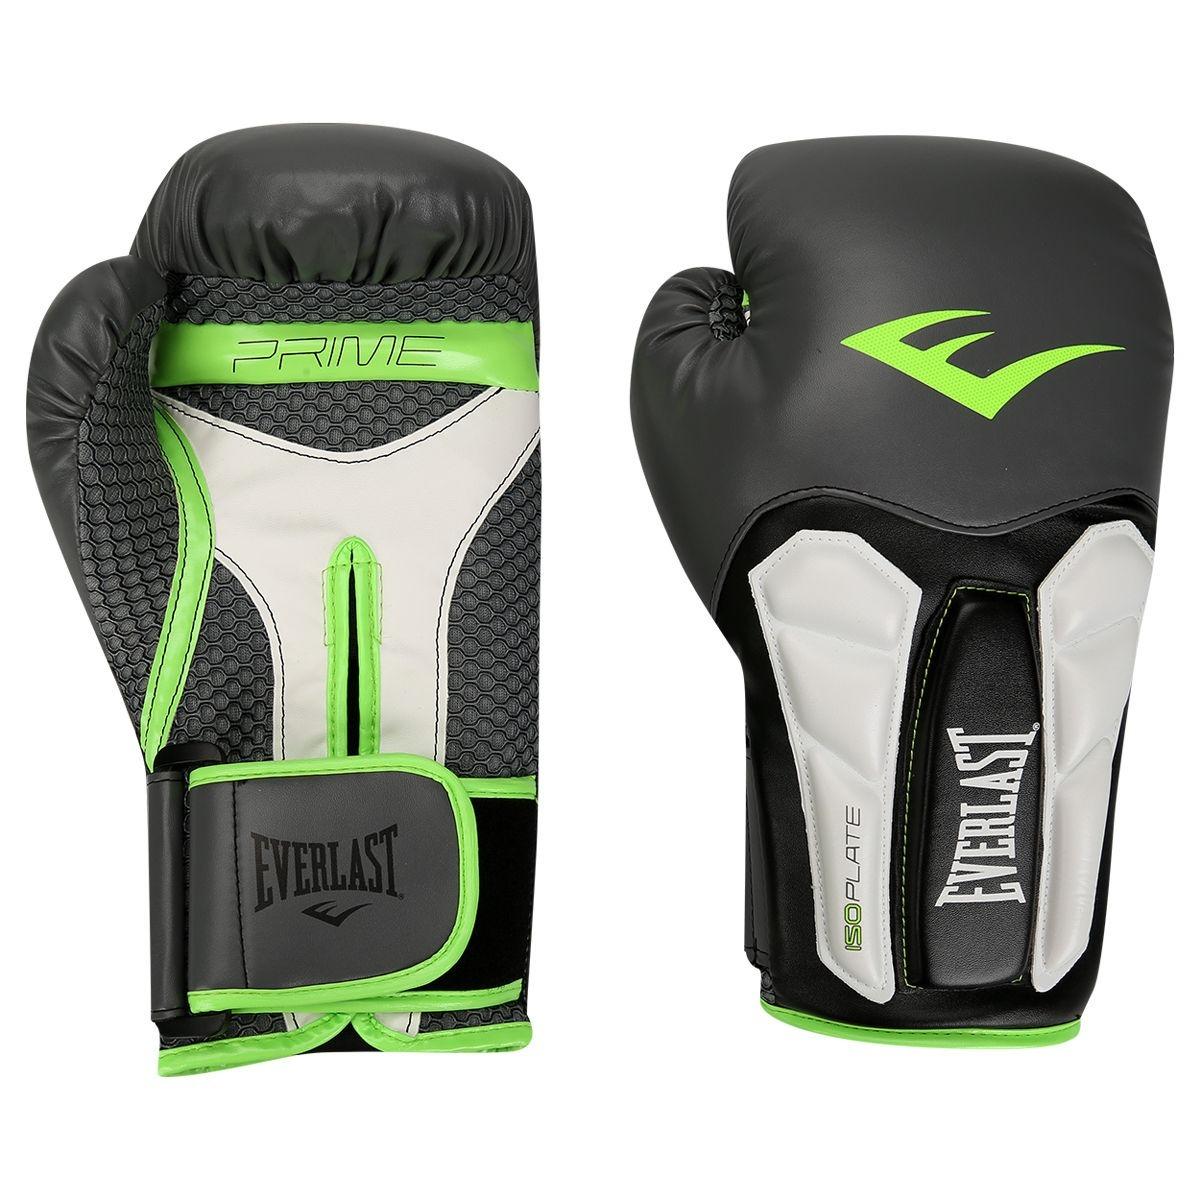 Luva Everlast Boxe Muay Thai Preta 8 5734e33f0ec61